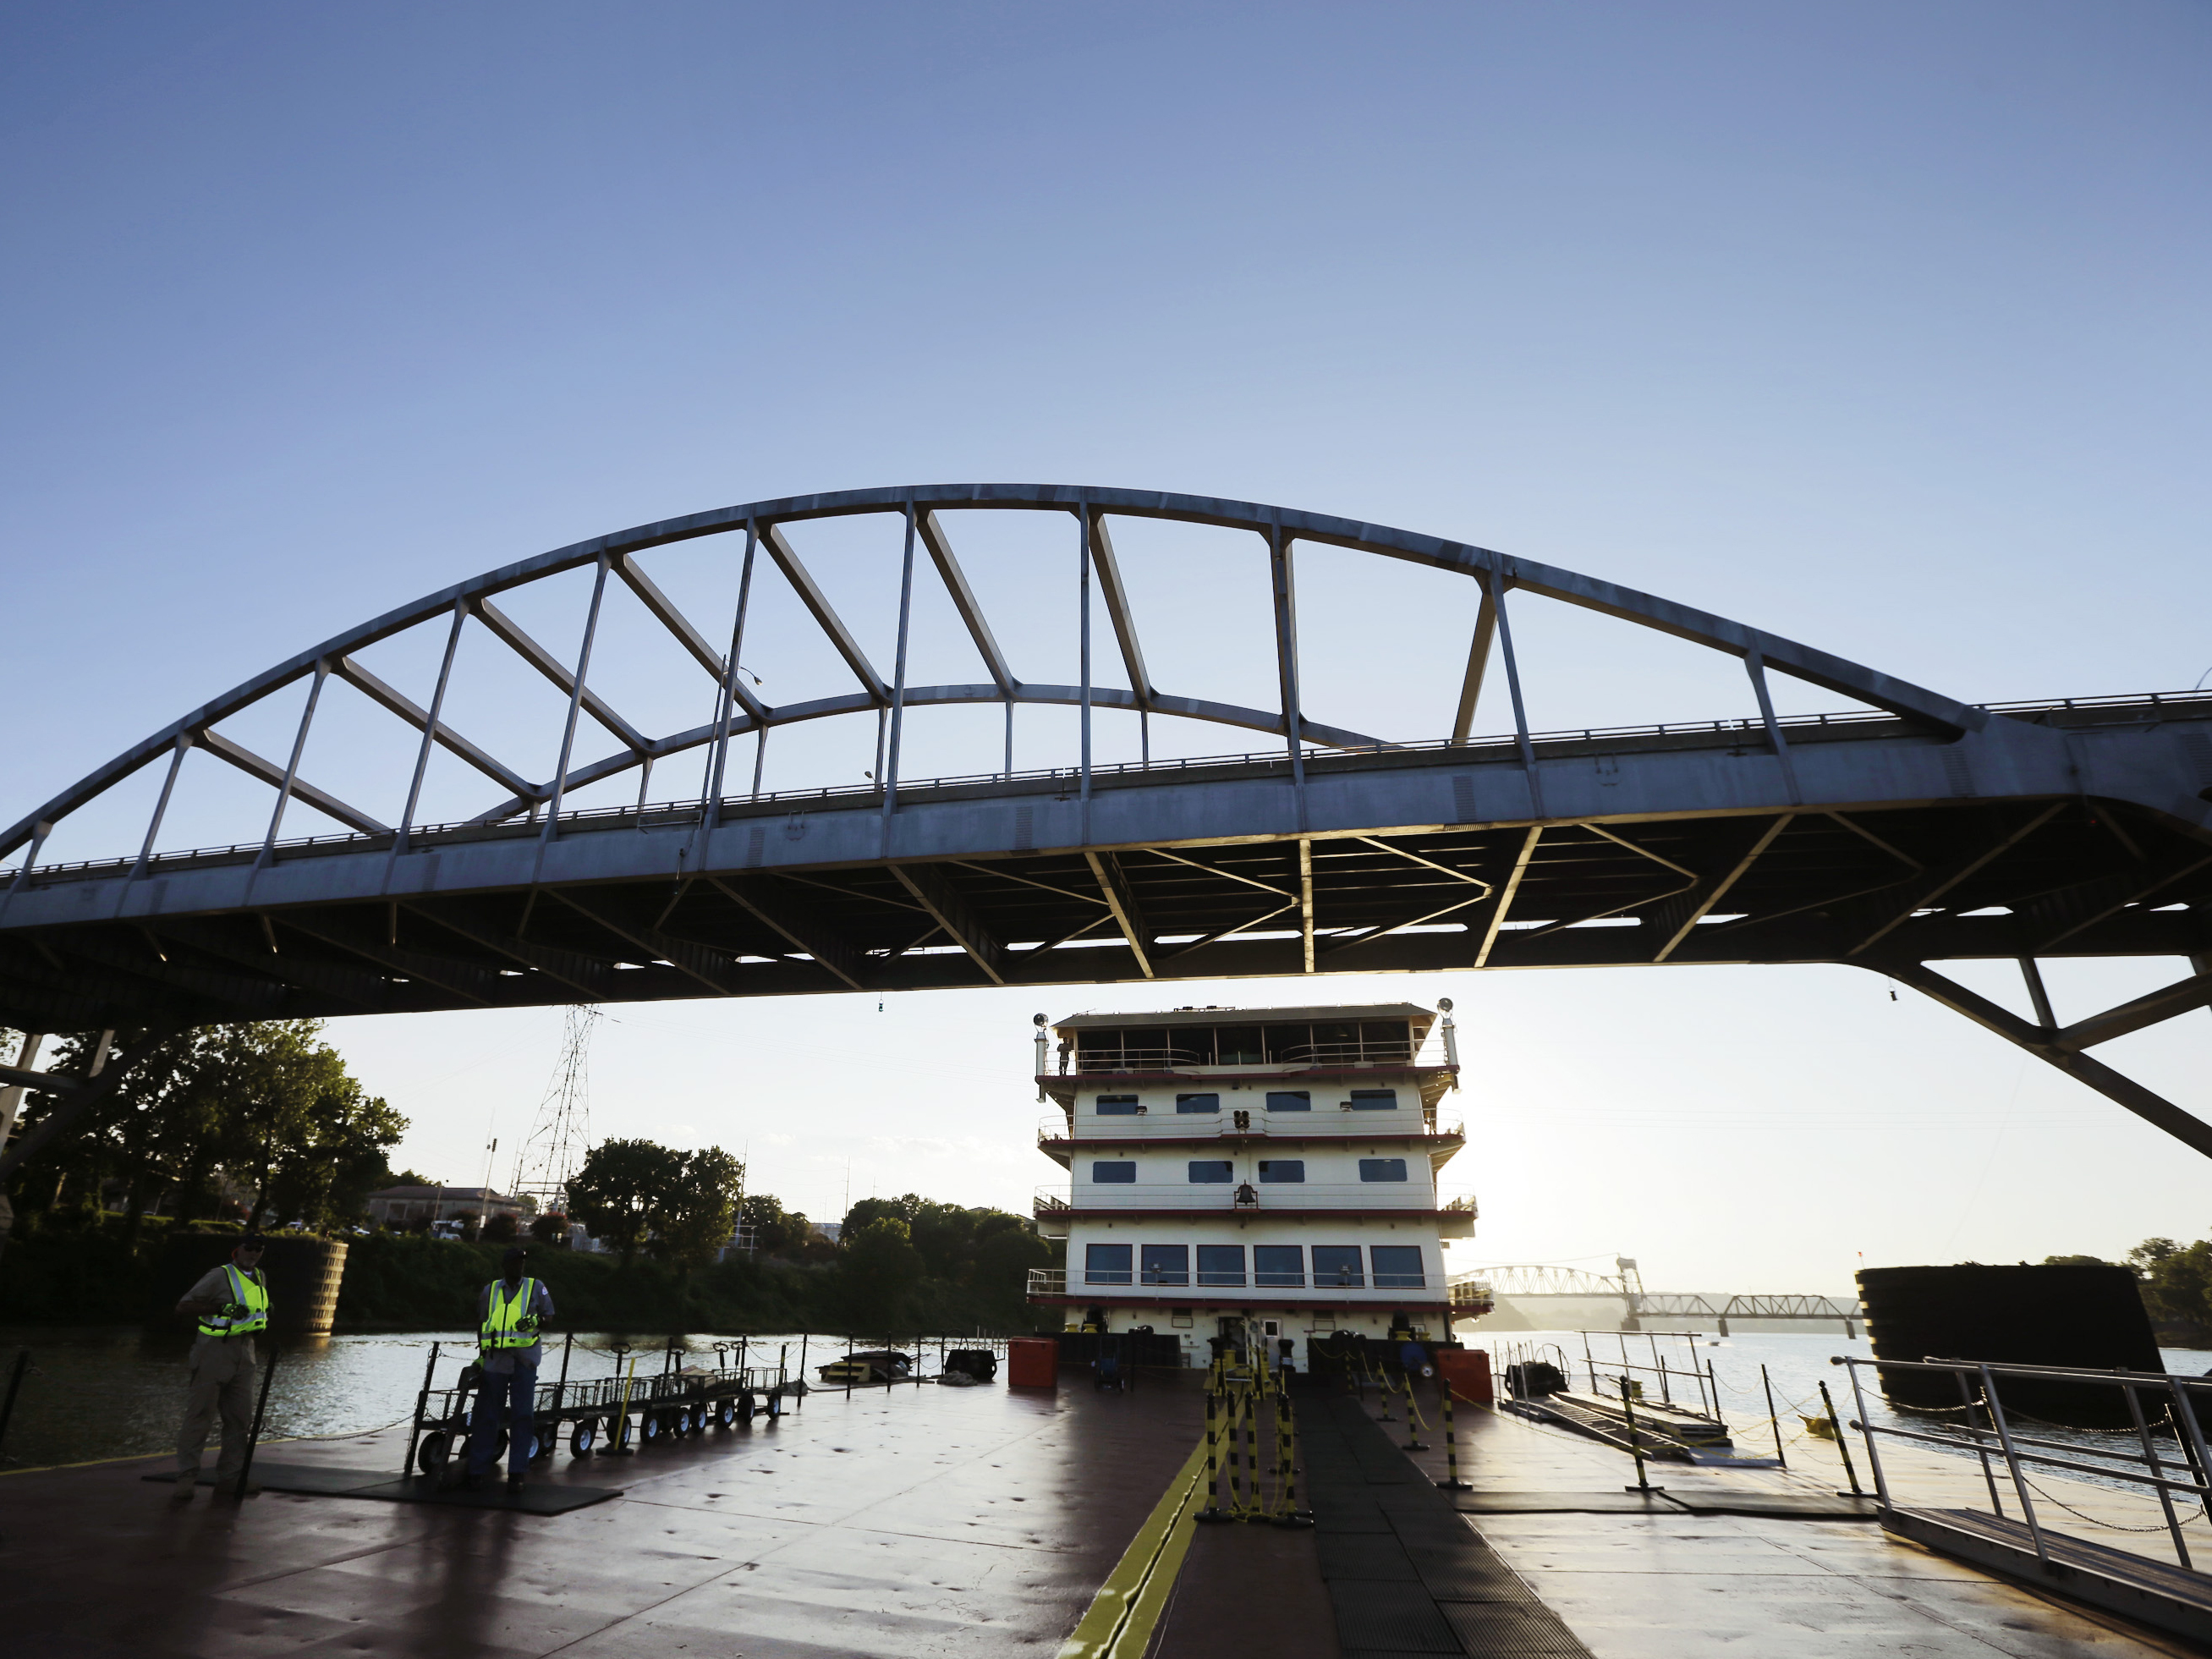 Explosives fail to bring down 93-year-old Arkansas bridge